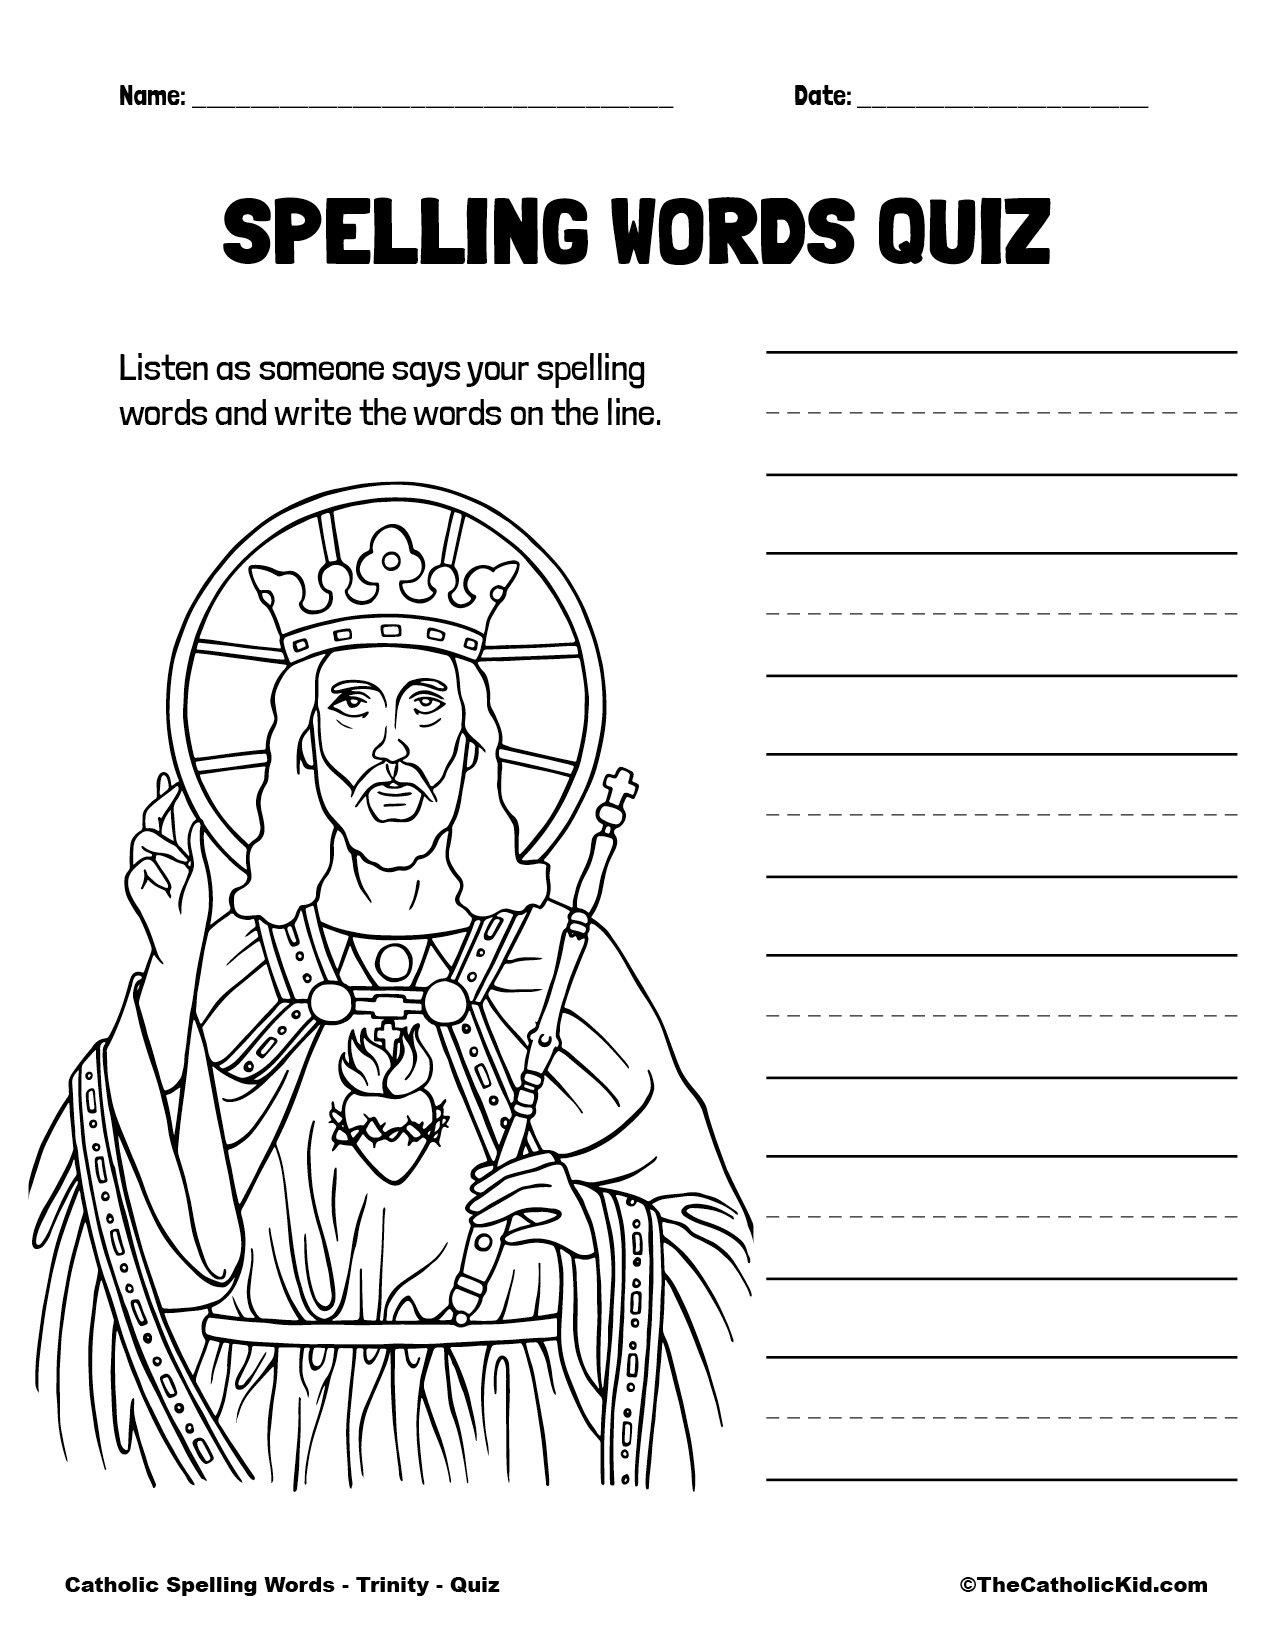 Catholic Spelling & Vocabulary Words Trinity Worksheet 5 Quiz